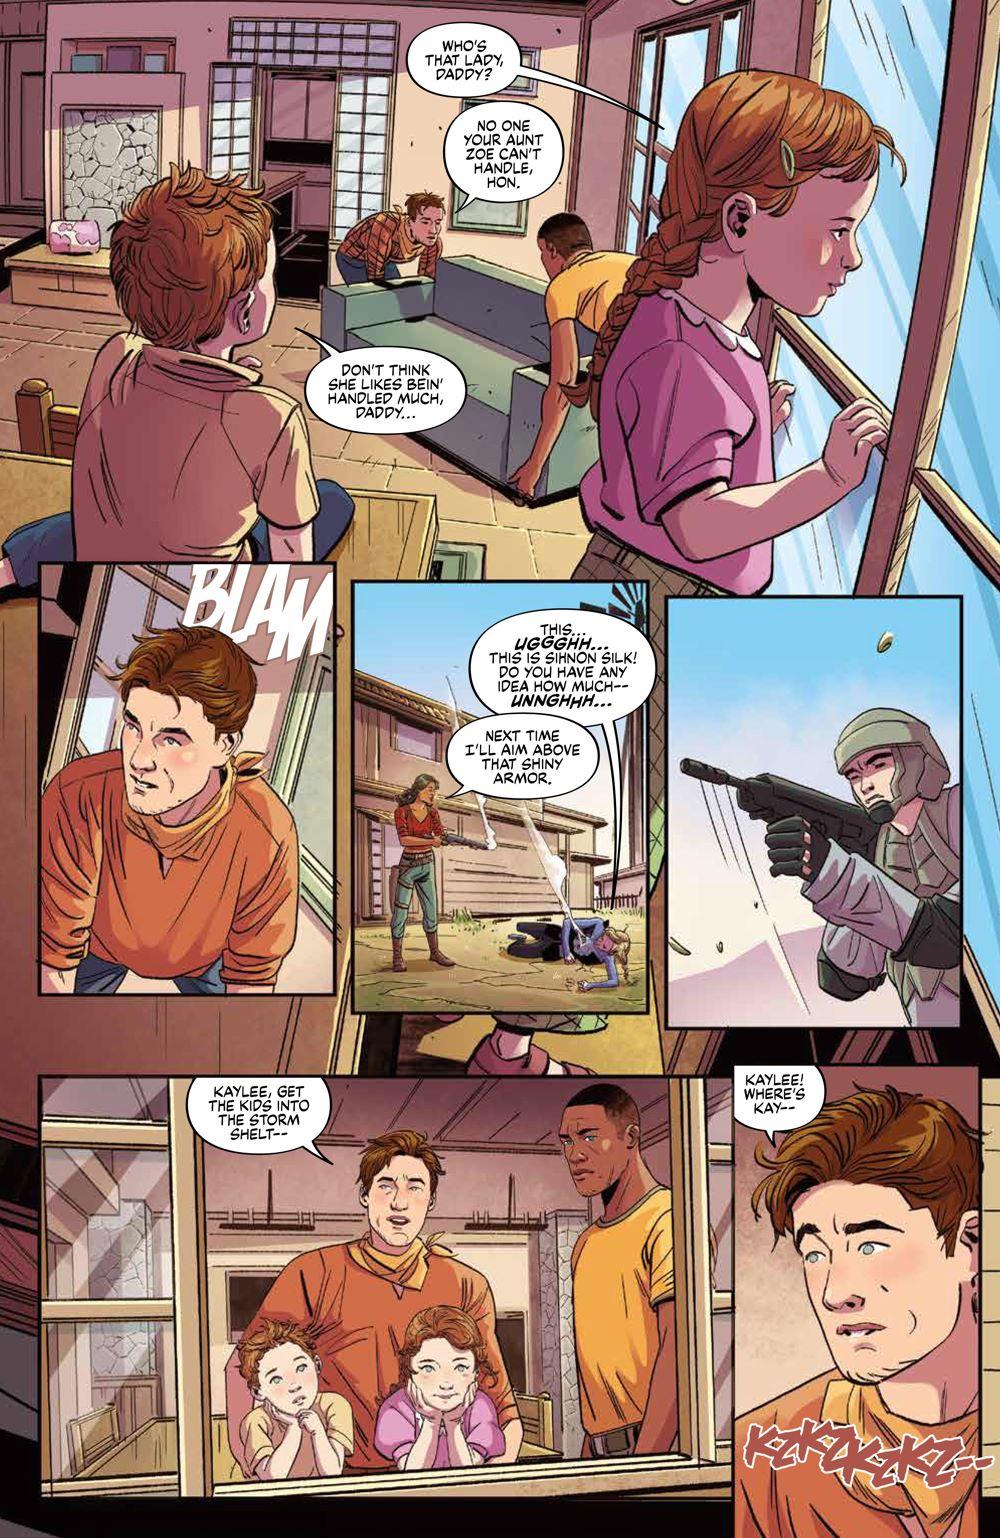 Firefly_BrandNewVerse_004_PRESS_5 ComicList Previews: FIREFLY A BRAND NEW 'VERSE #4 (OF 6)